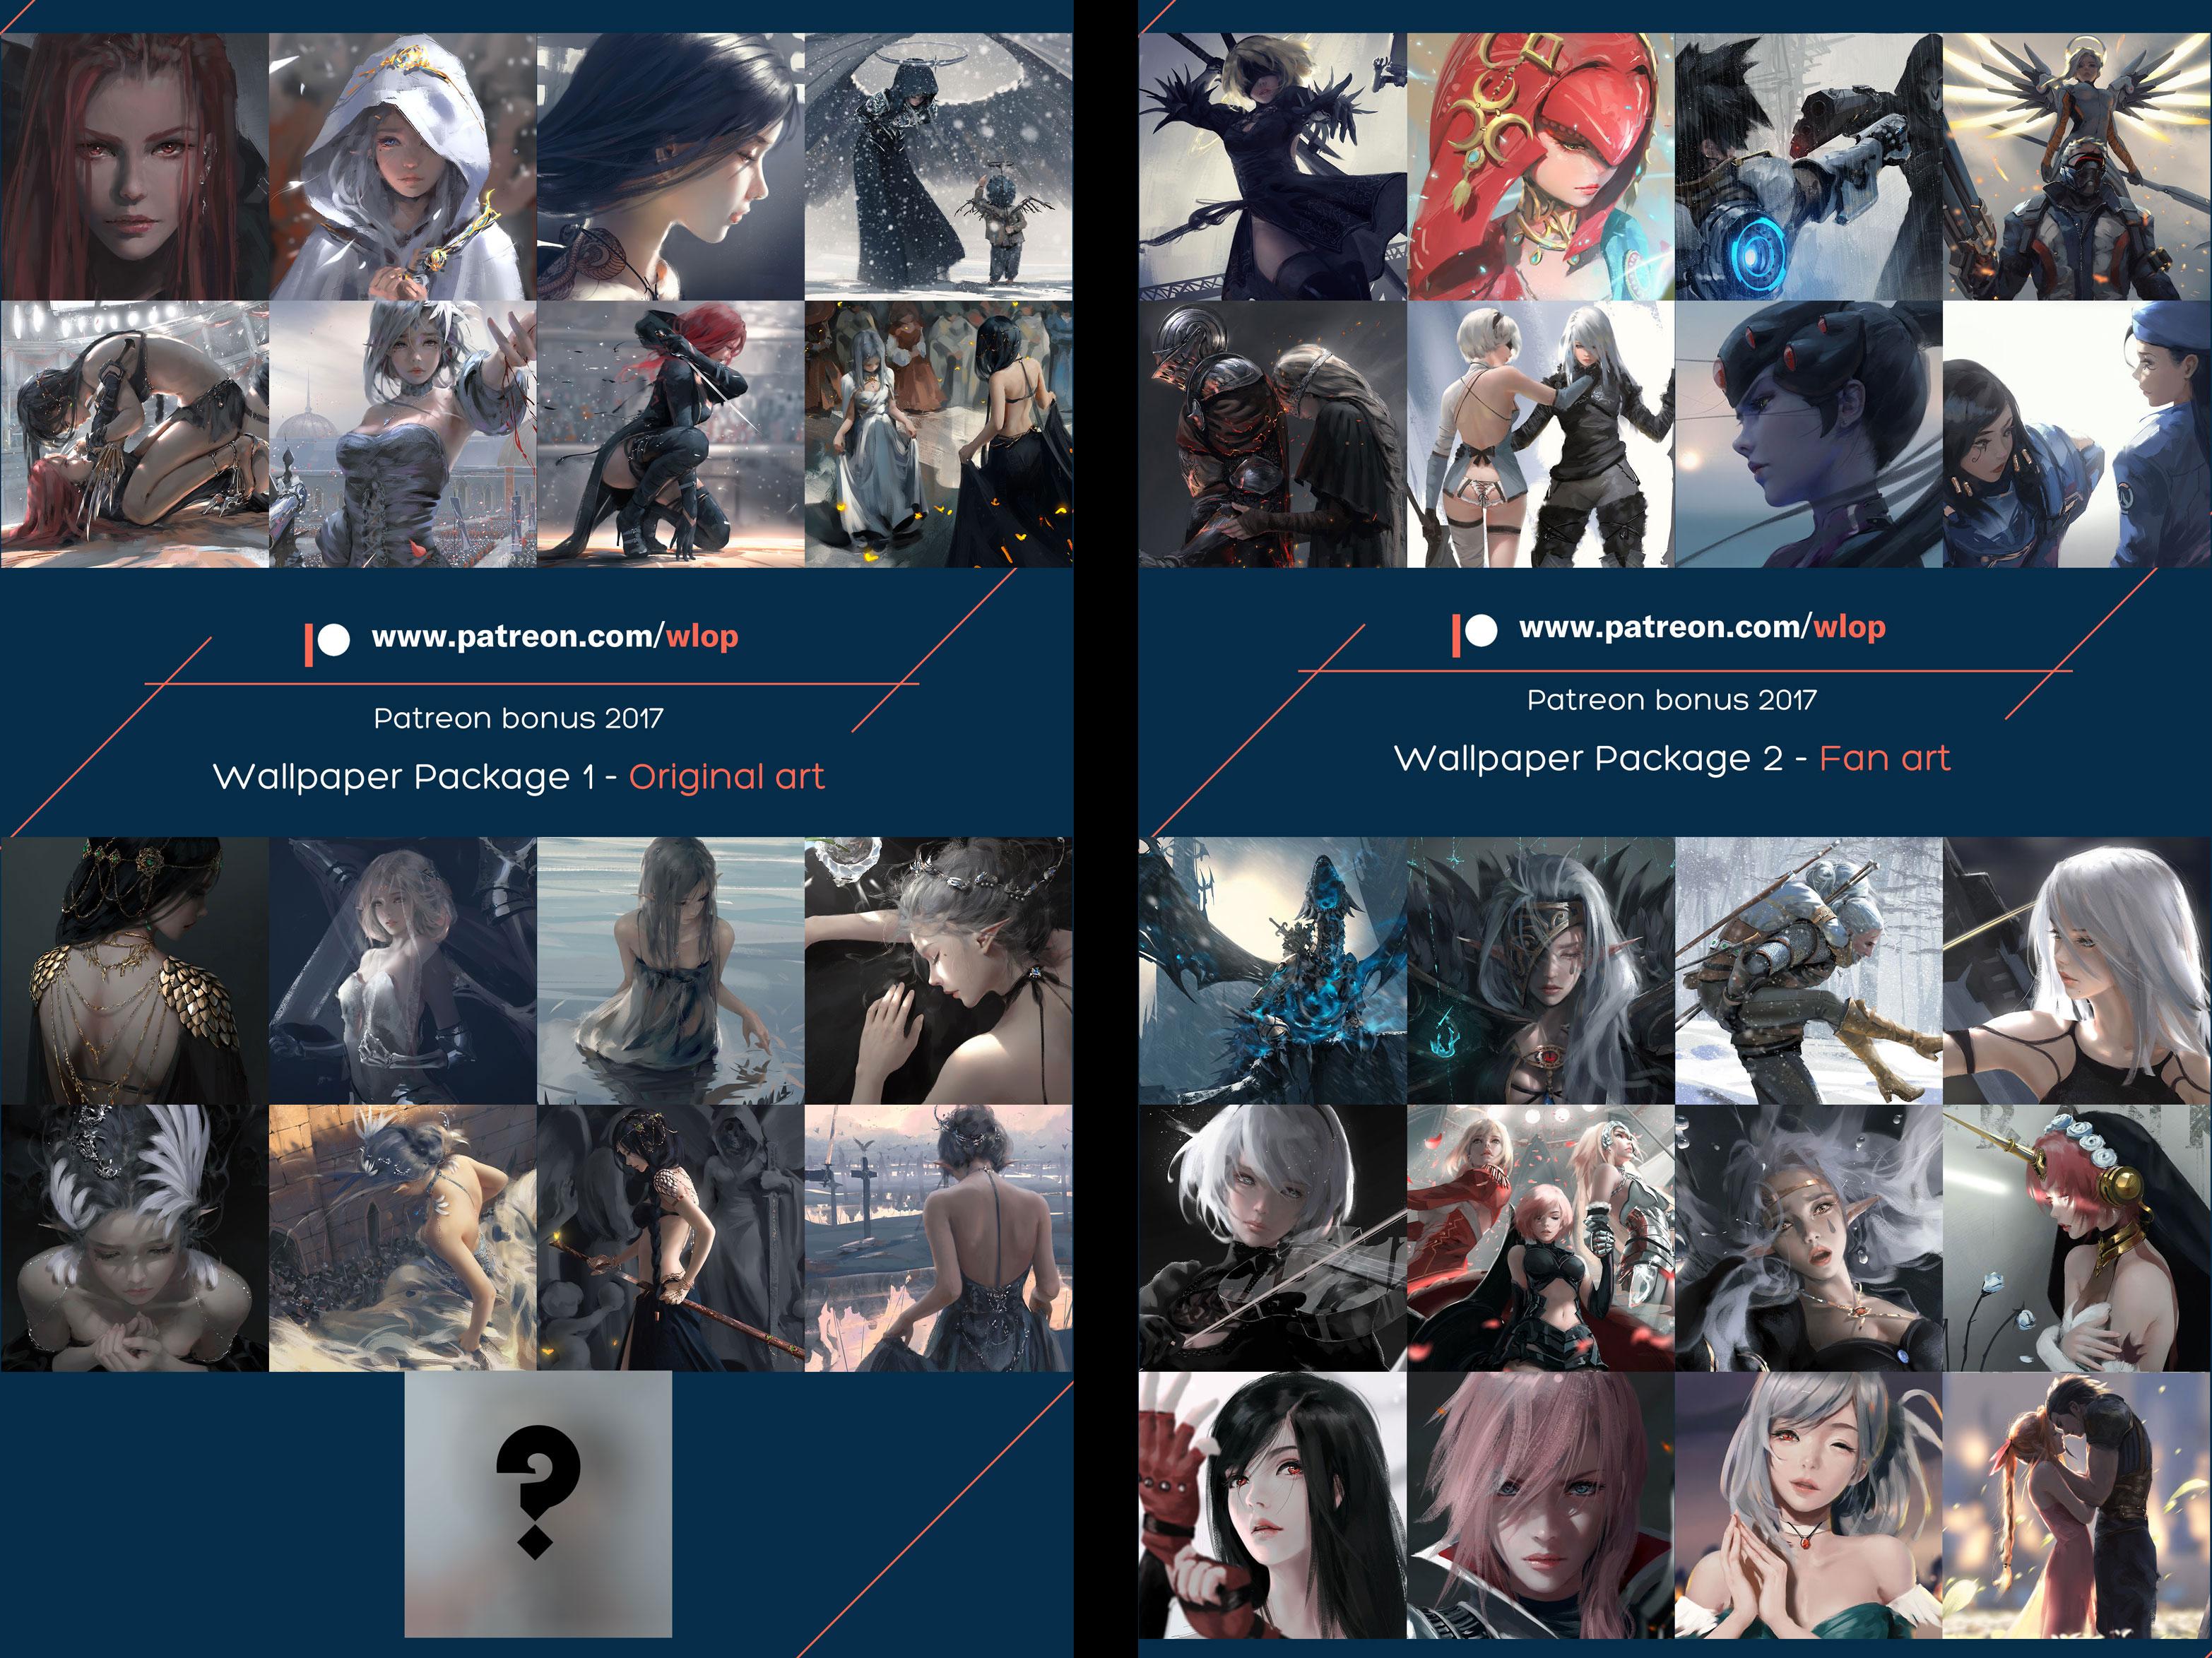 2017 wallpaper package by wlop on DeviantArt